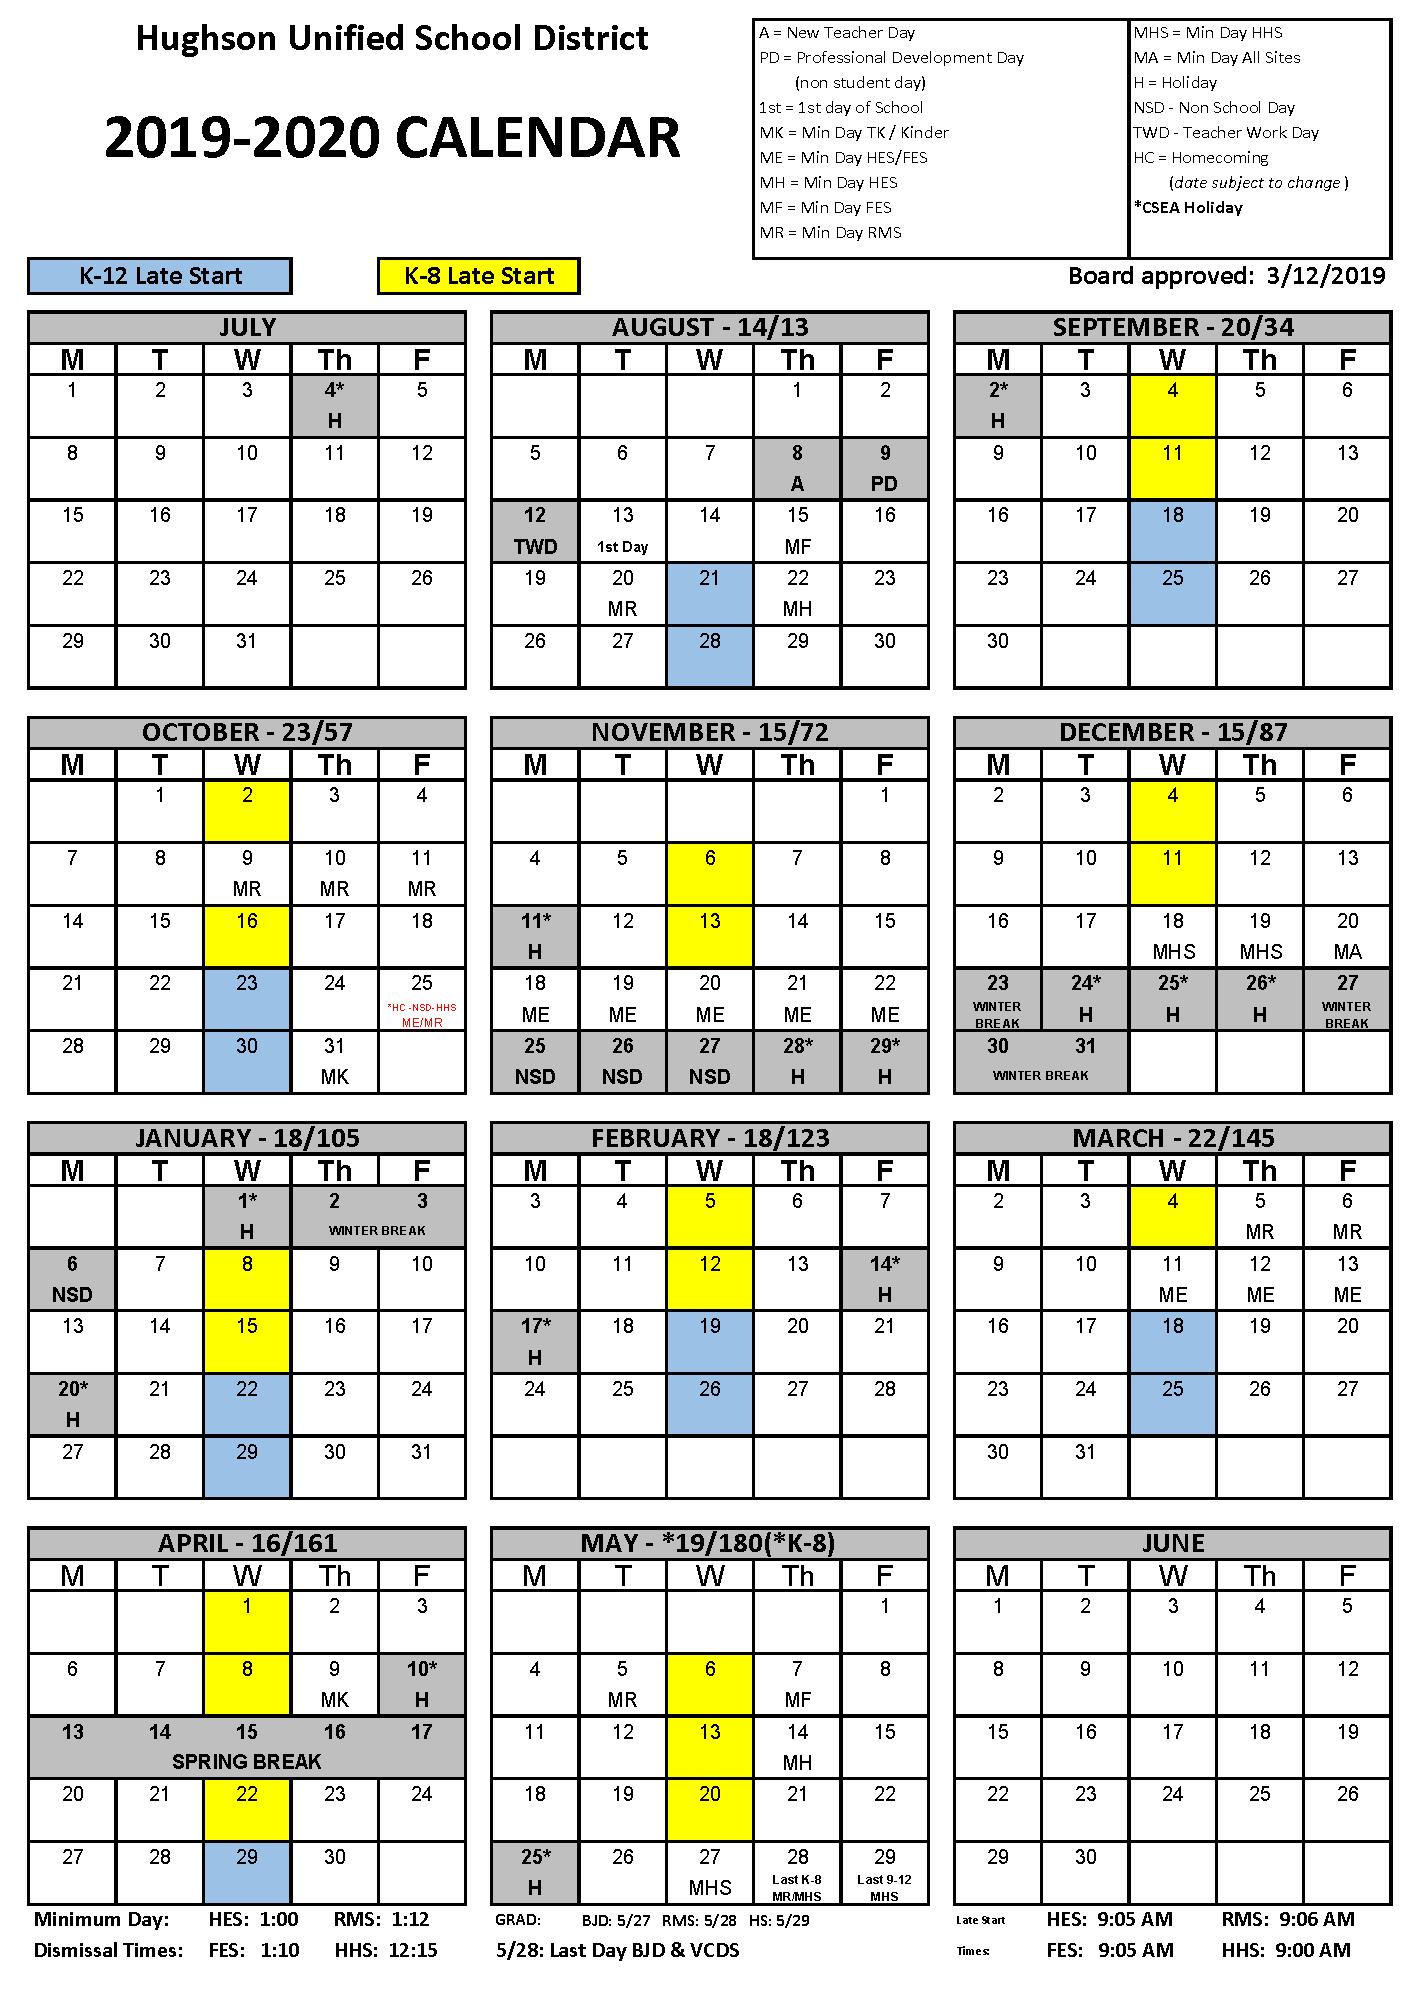 Miami Dade College School Calendar 2021 2020 | Printable For Delaware State University 2021 2020 Calendar